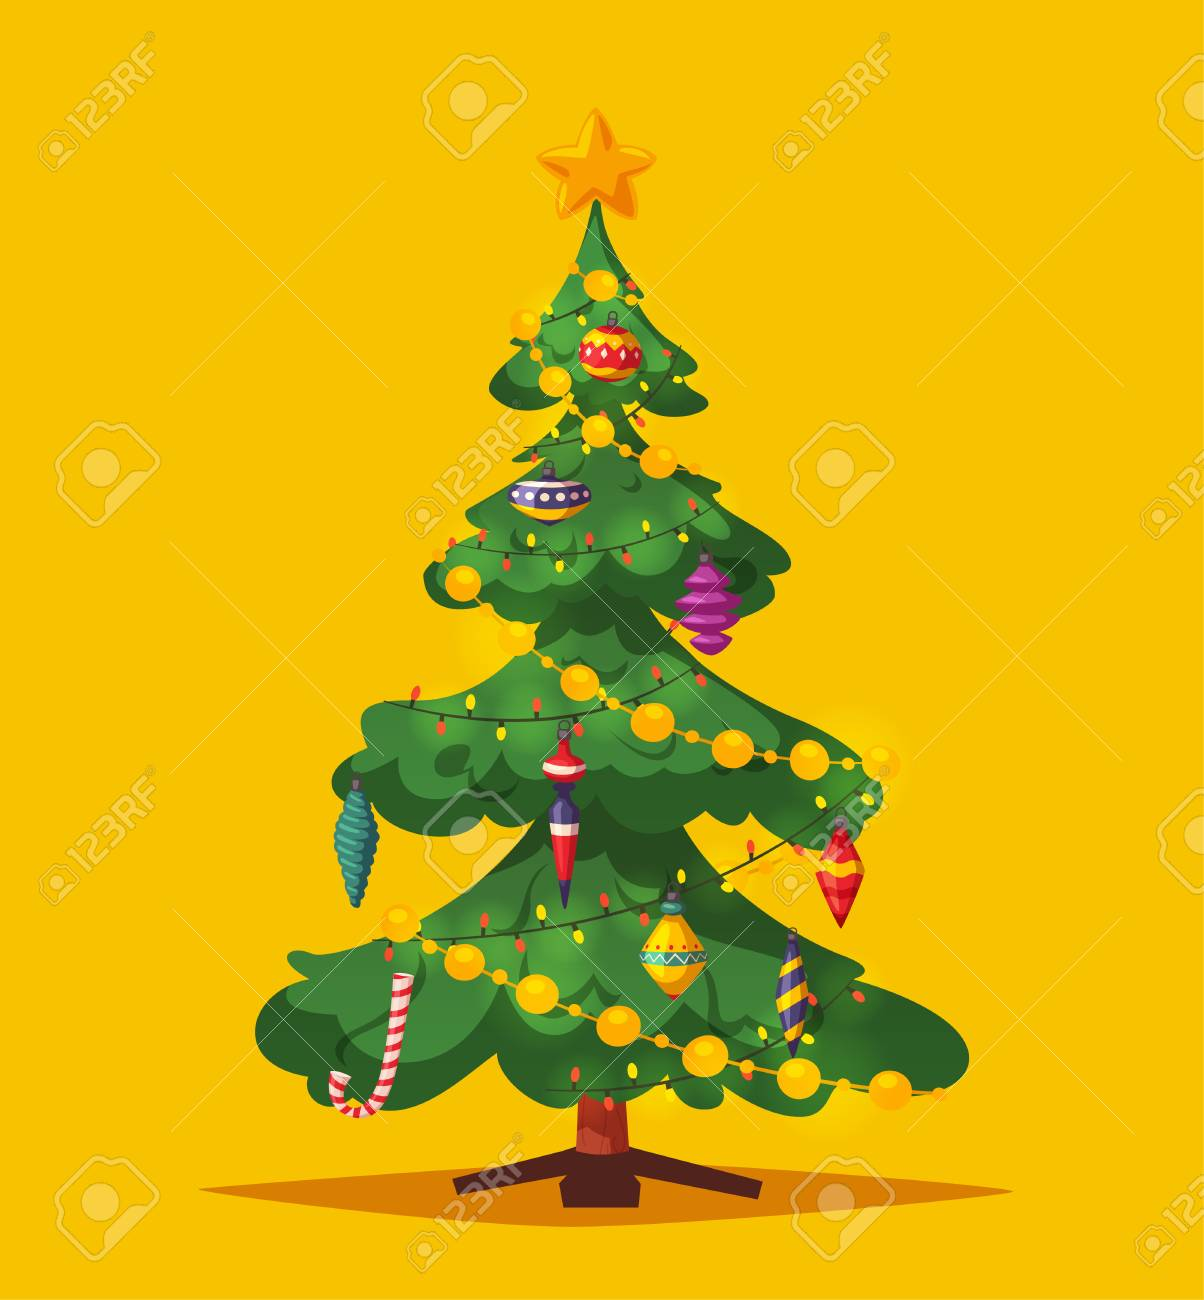 Beautiful Christmas Tree Cartoon Vector Illustration Traditional Royalty Free Cliparts Vectors And Stock Illustration Image 112679249